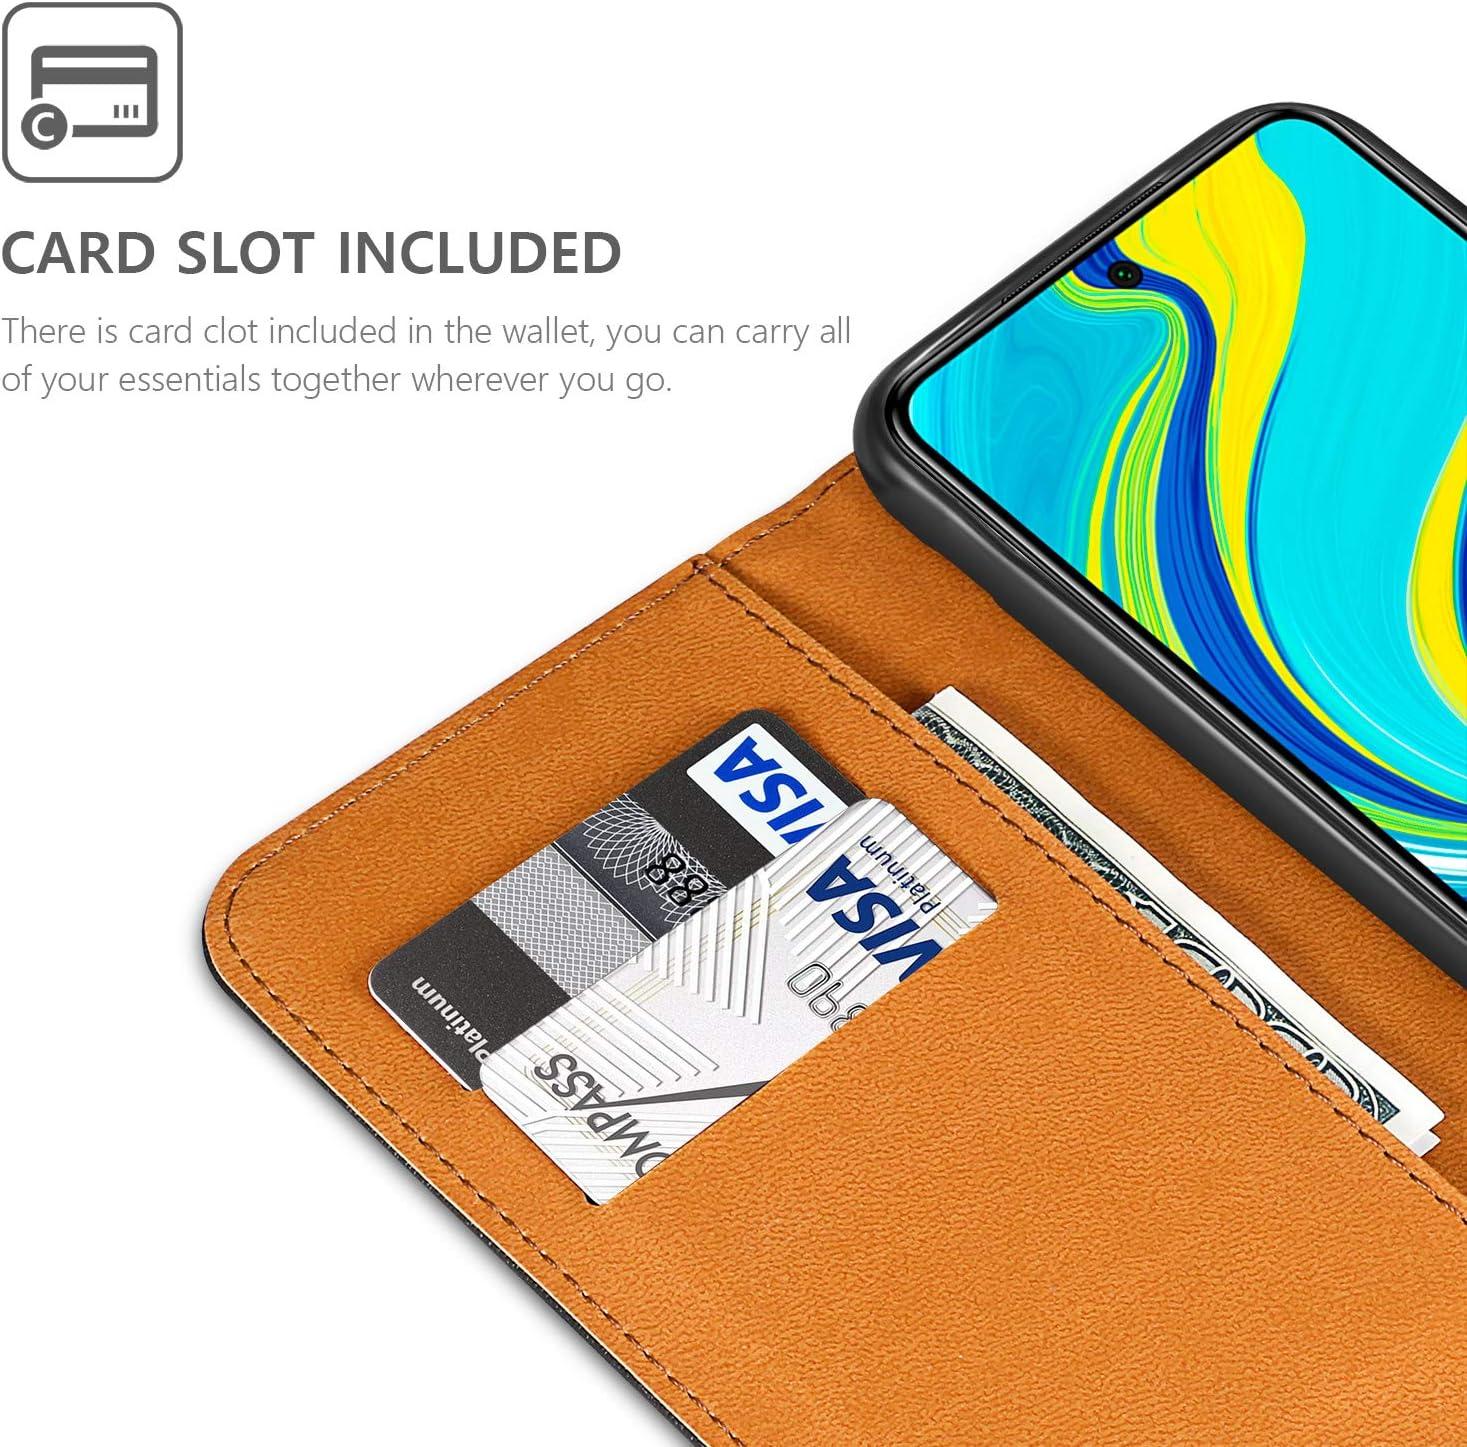 ivencase Funda para Xiaomi Redmi Note 9S//9 Pro//Pro MAX Protector de Pantalla Libro Caso Cubierta Tapa Magn/ética Billetera Cuero PU Carcasa para Xiaomi Redmi Note 9S//9 Pro//Pro MAX Pen Negro